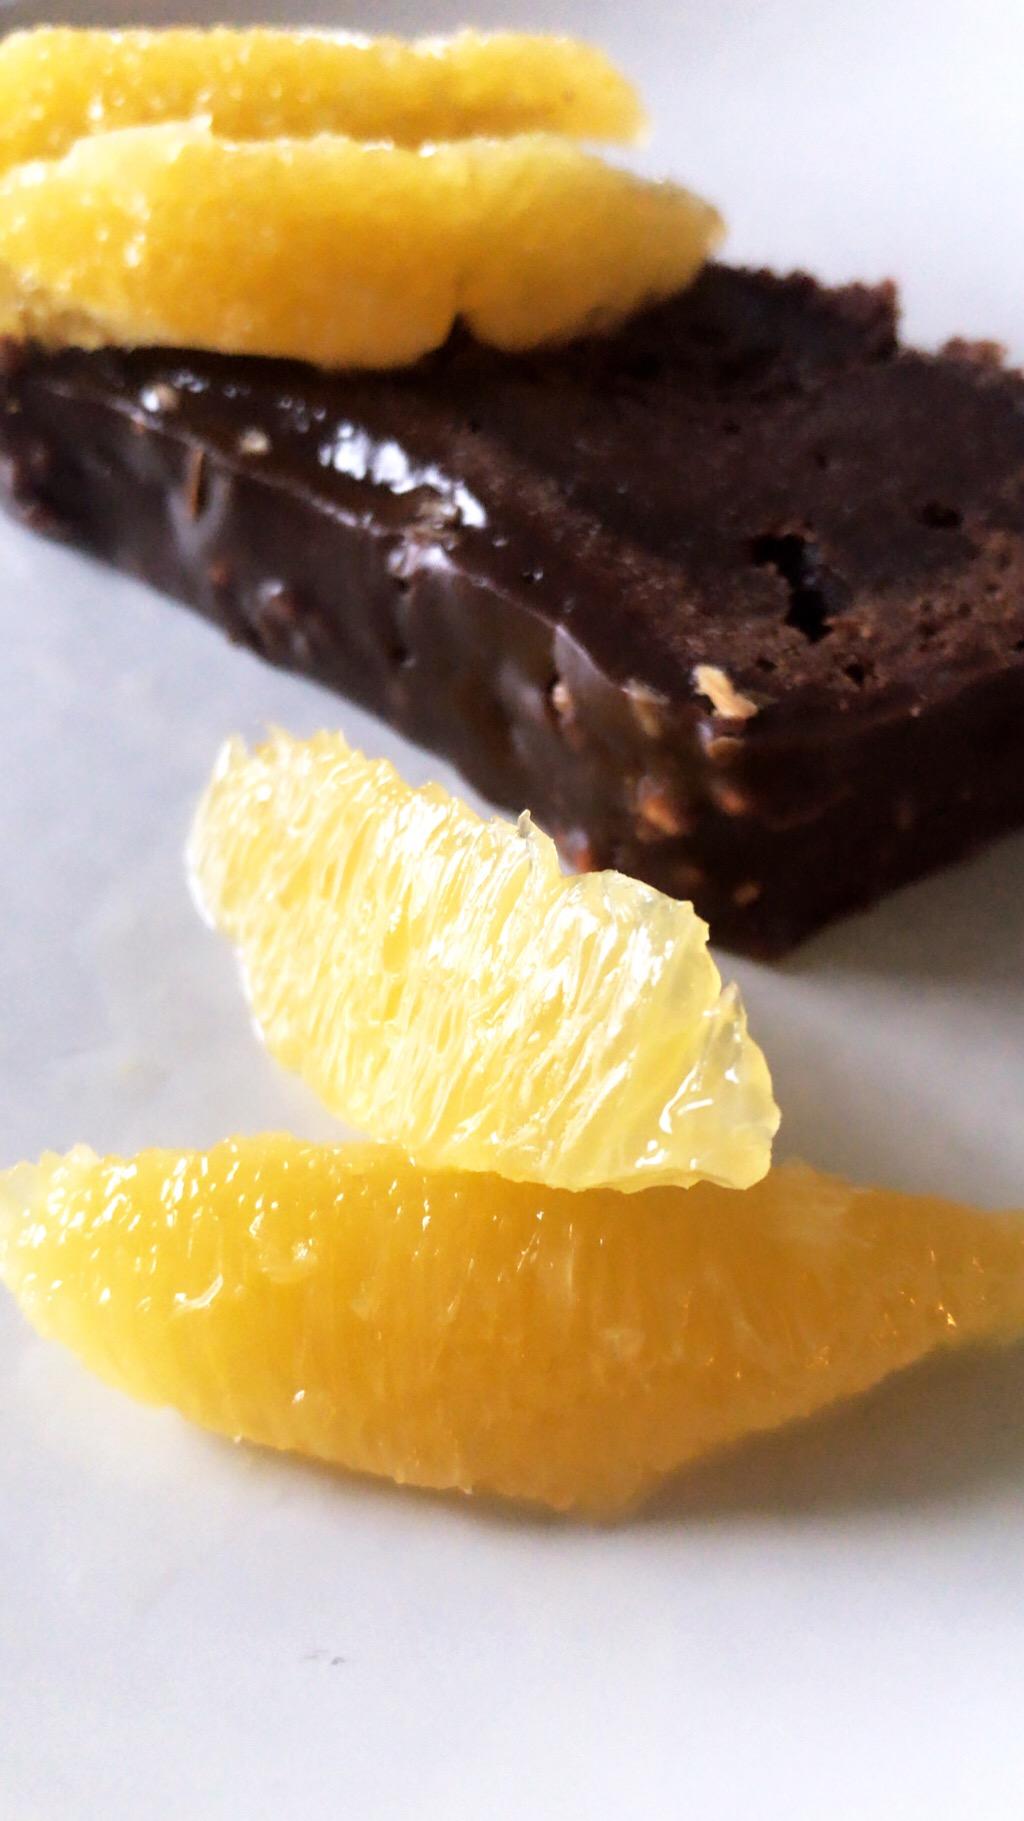 Chocolat l Suprêmes d'orange